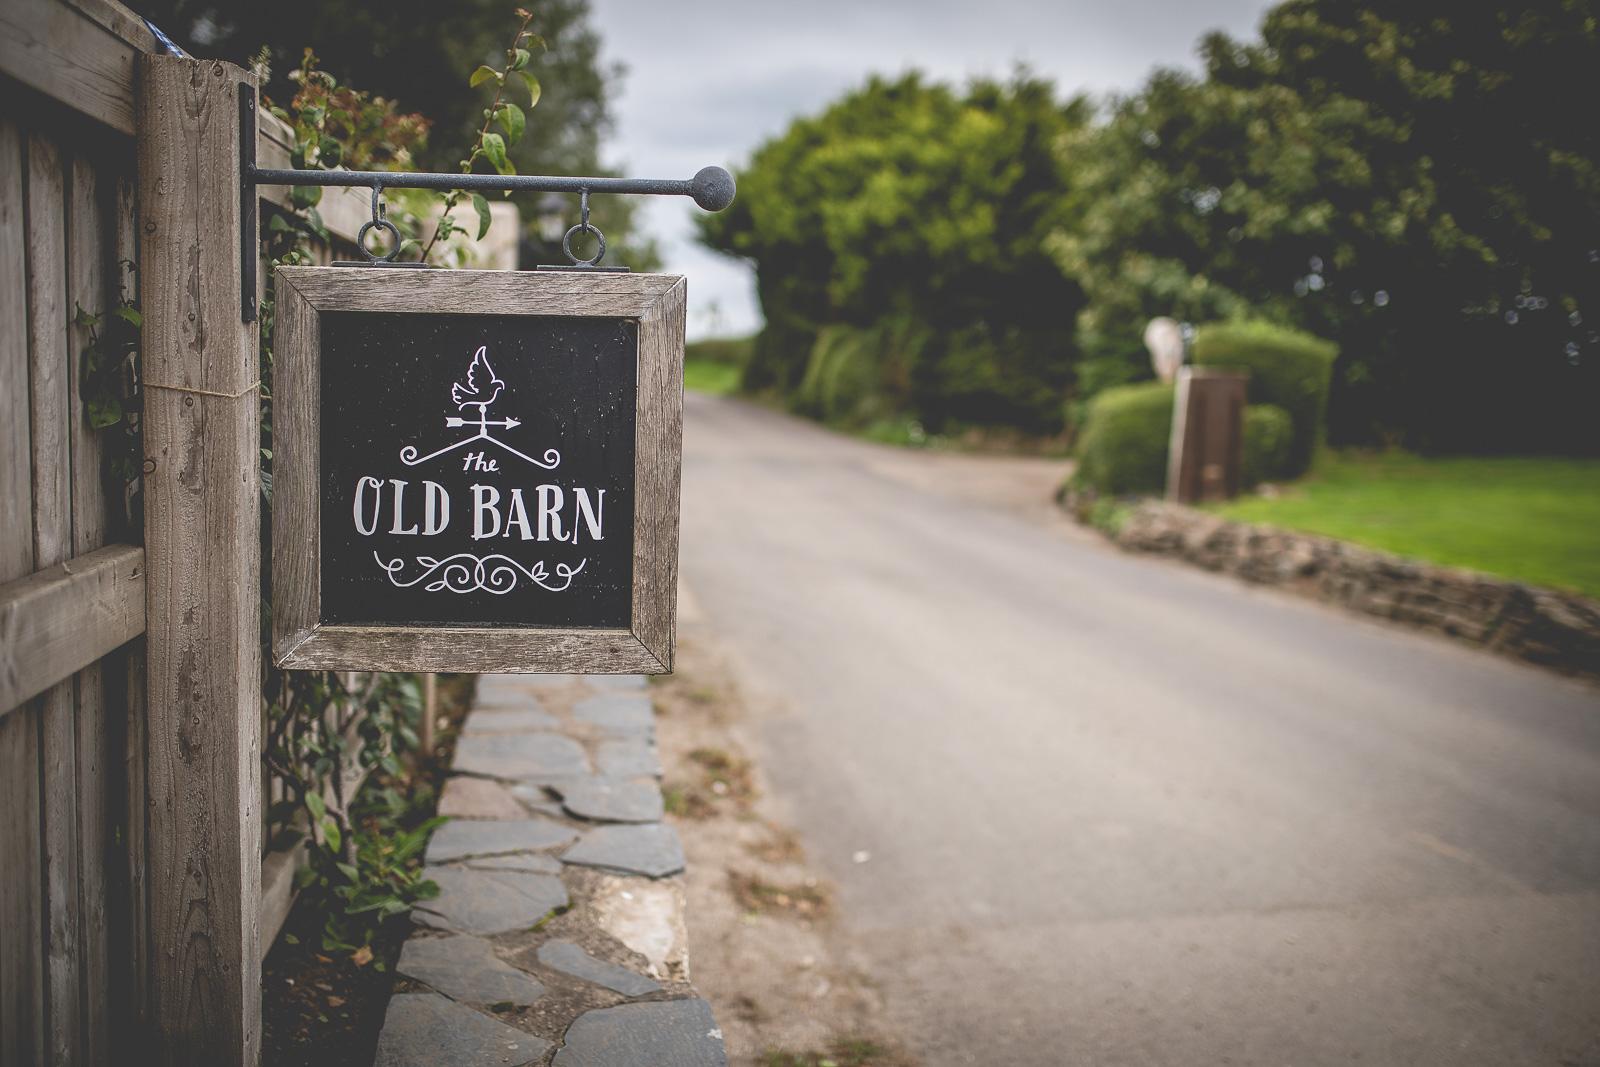 the old barn - clovelly - ugotthelove - wedding photography-2.jpg